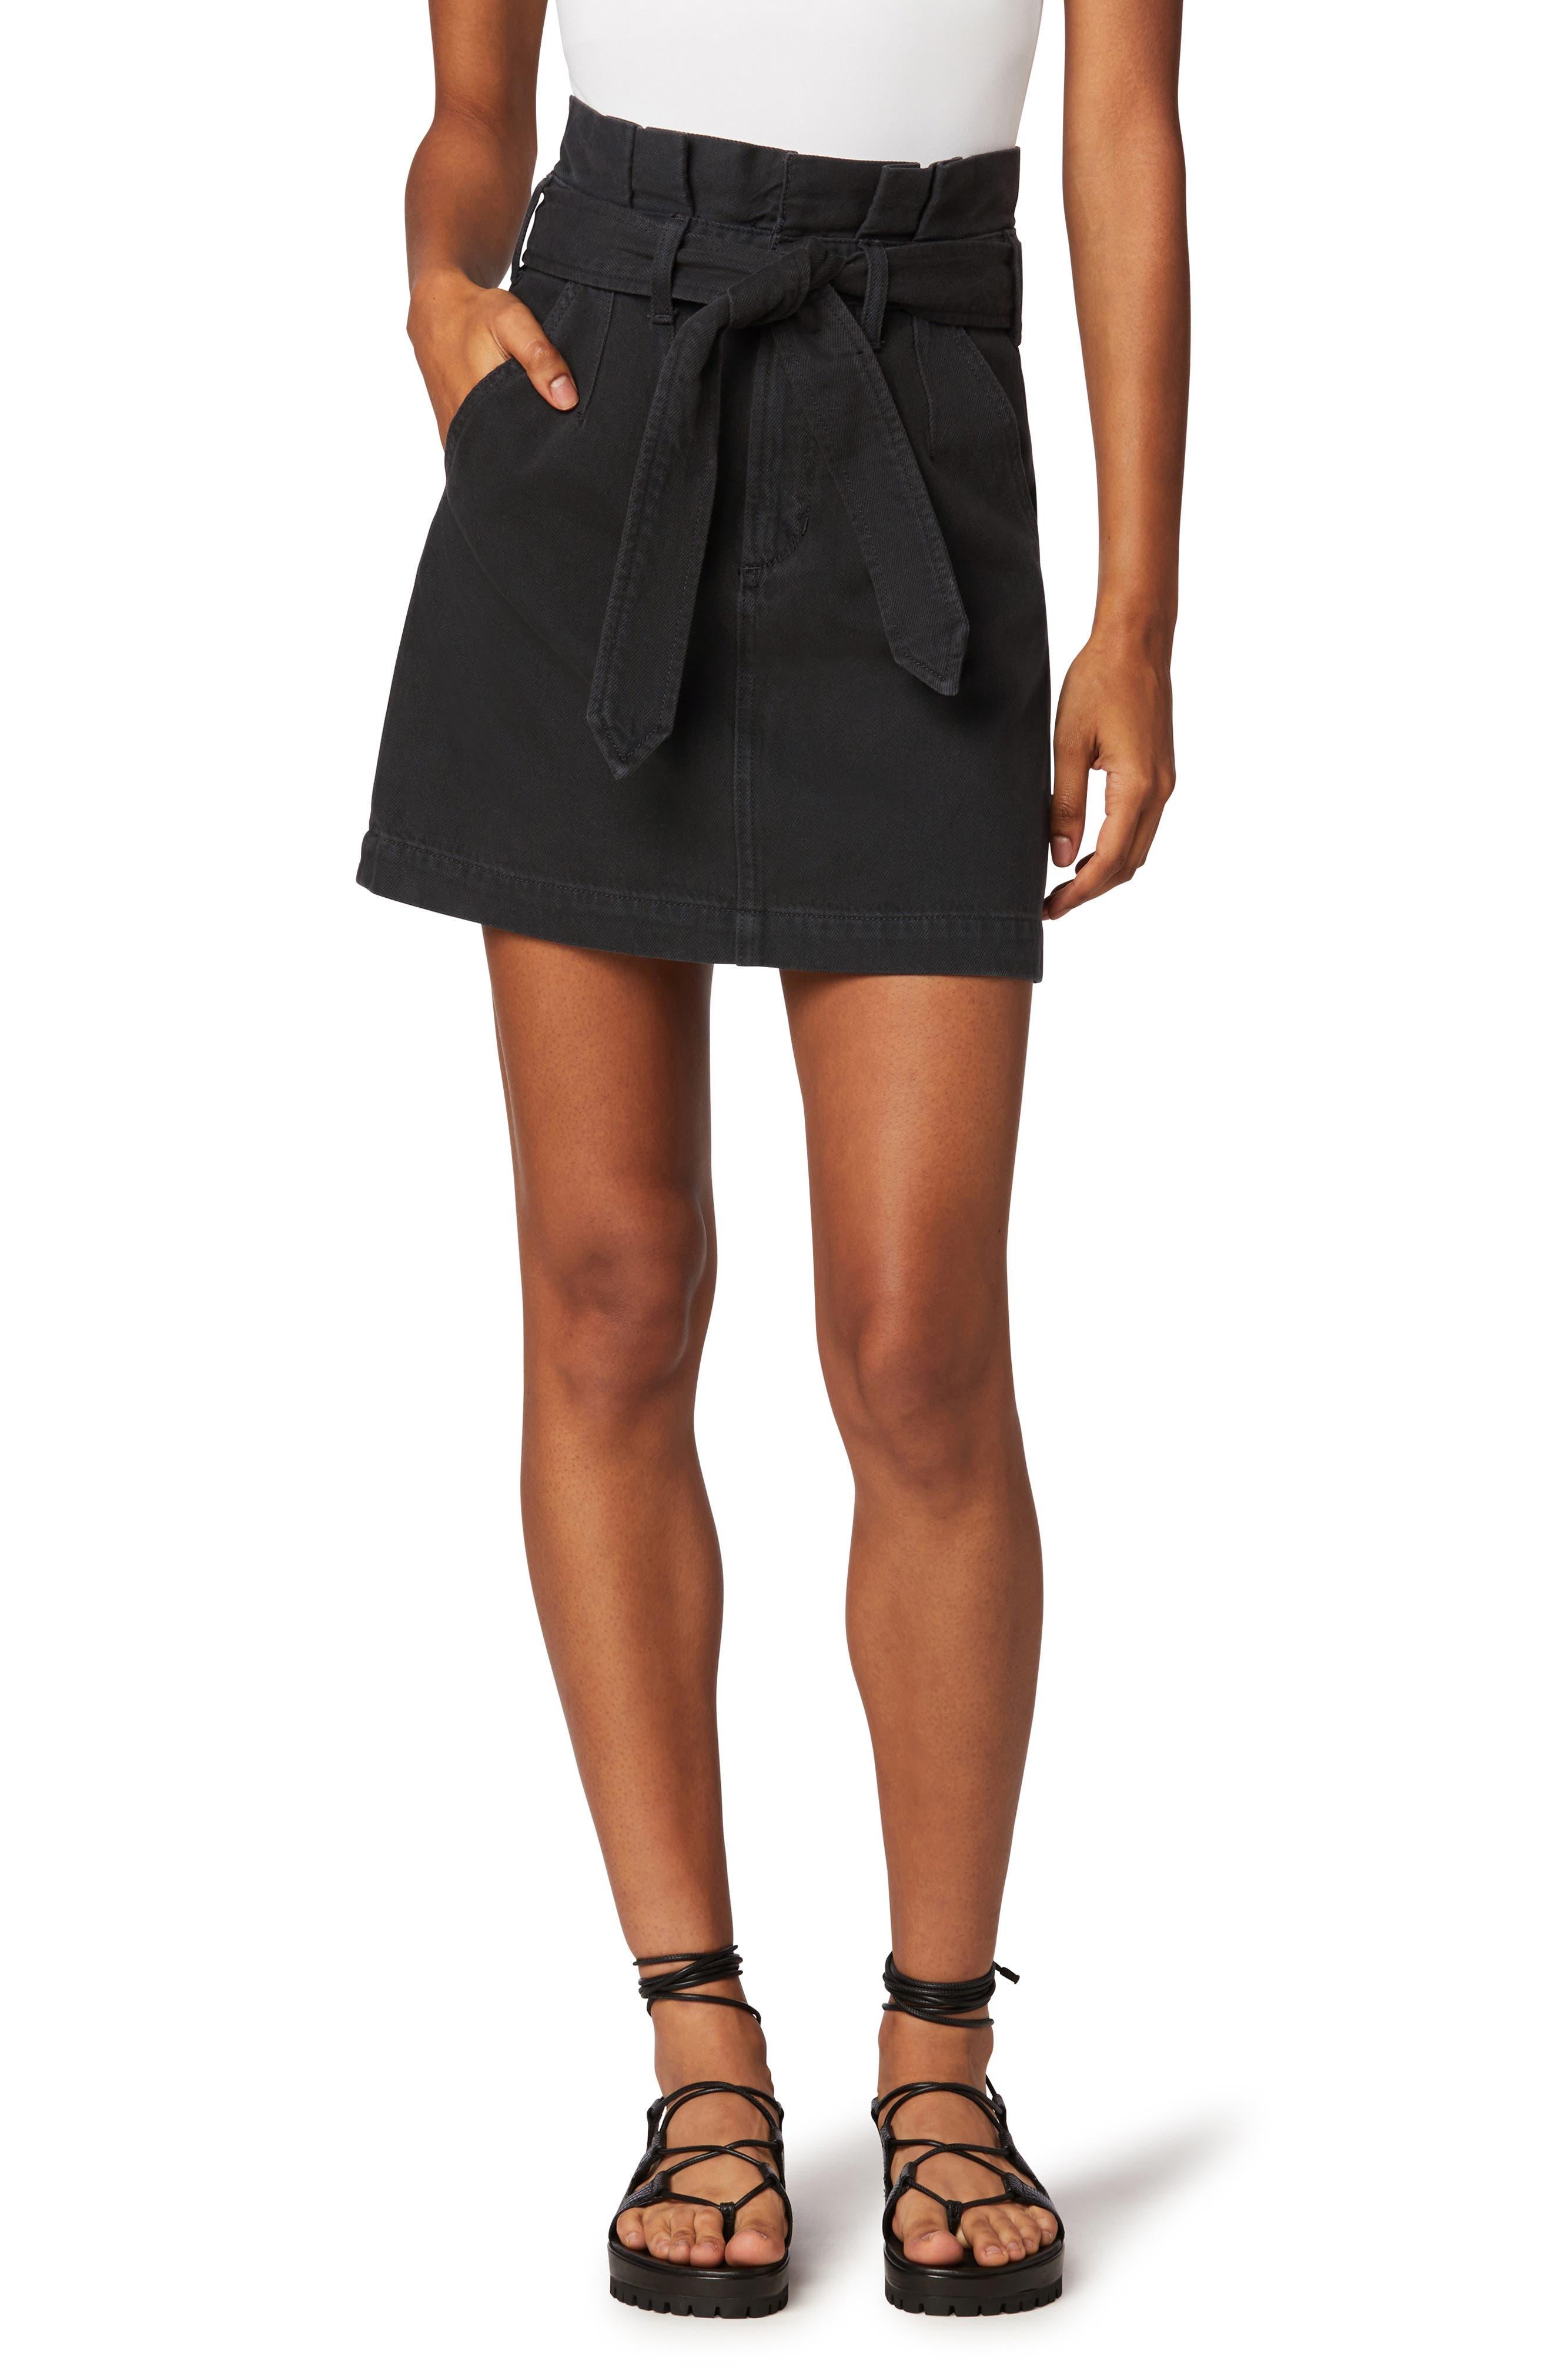 The Calypso Paperbag Waist Denim Mini Skirt